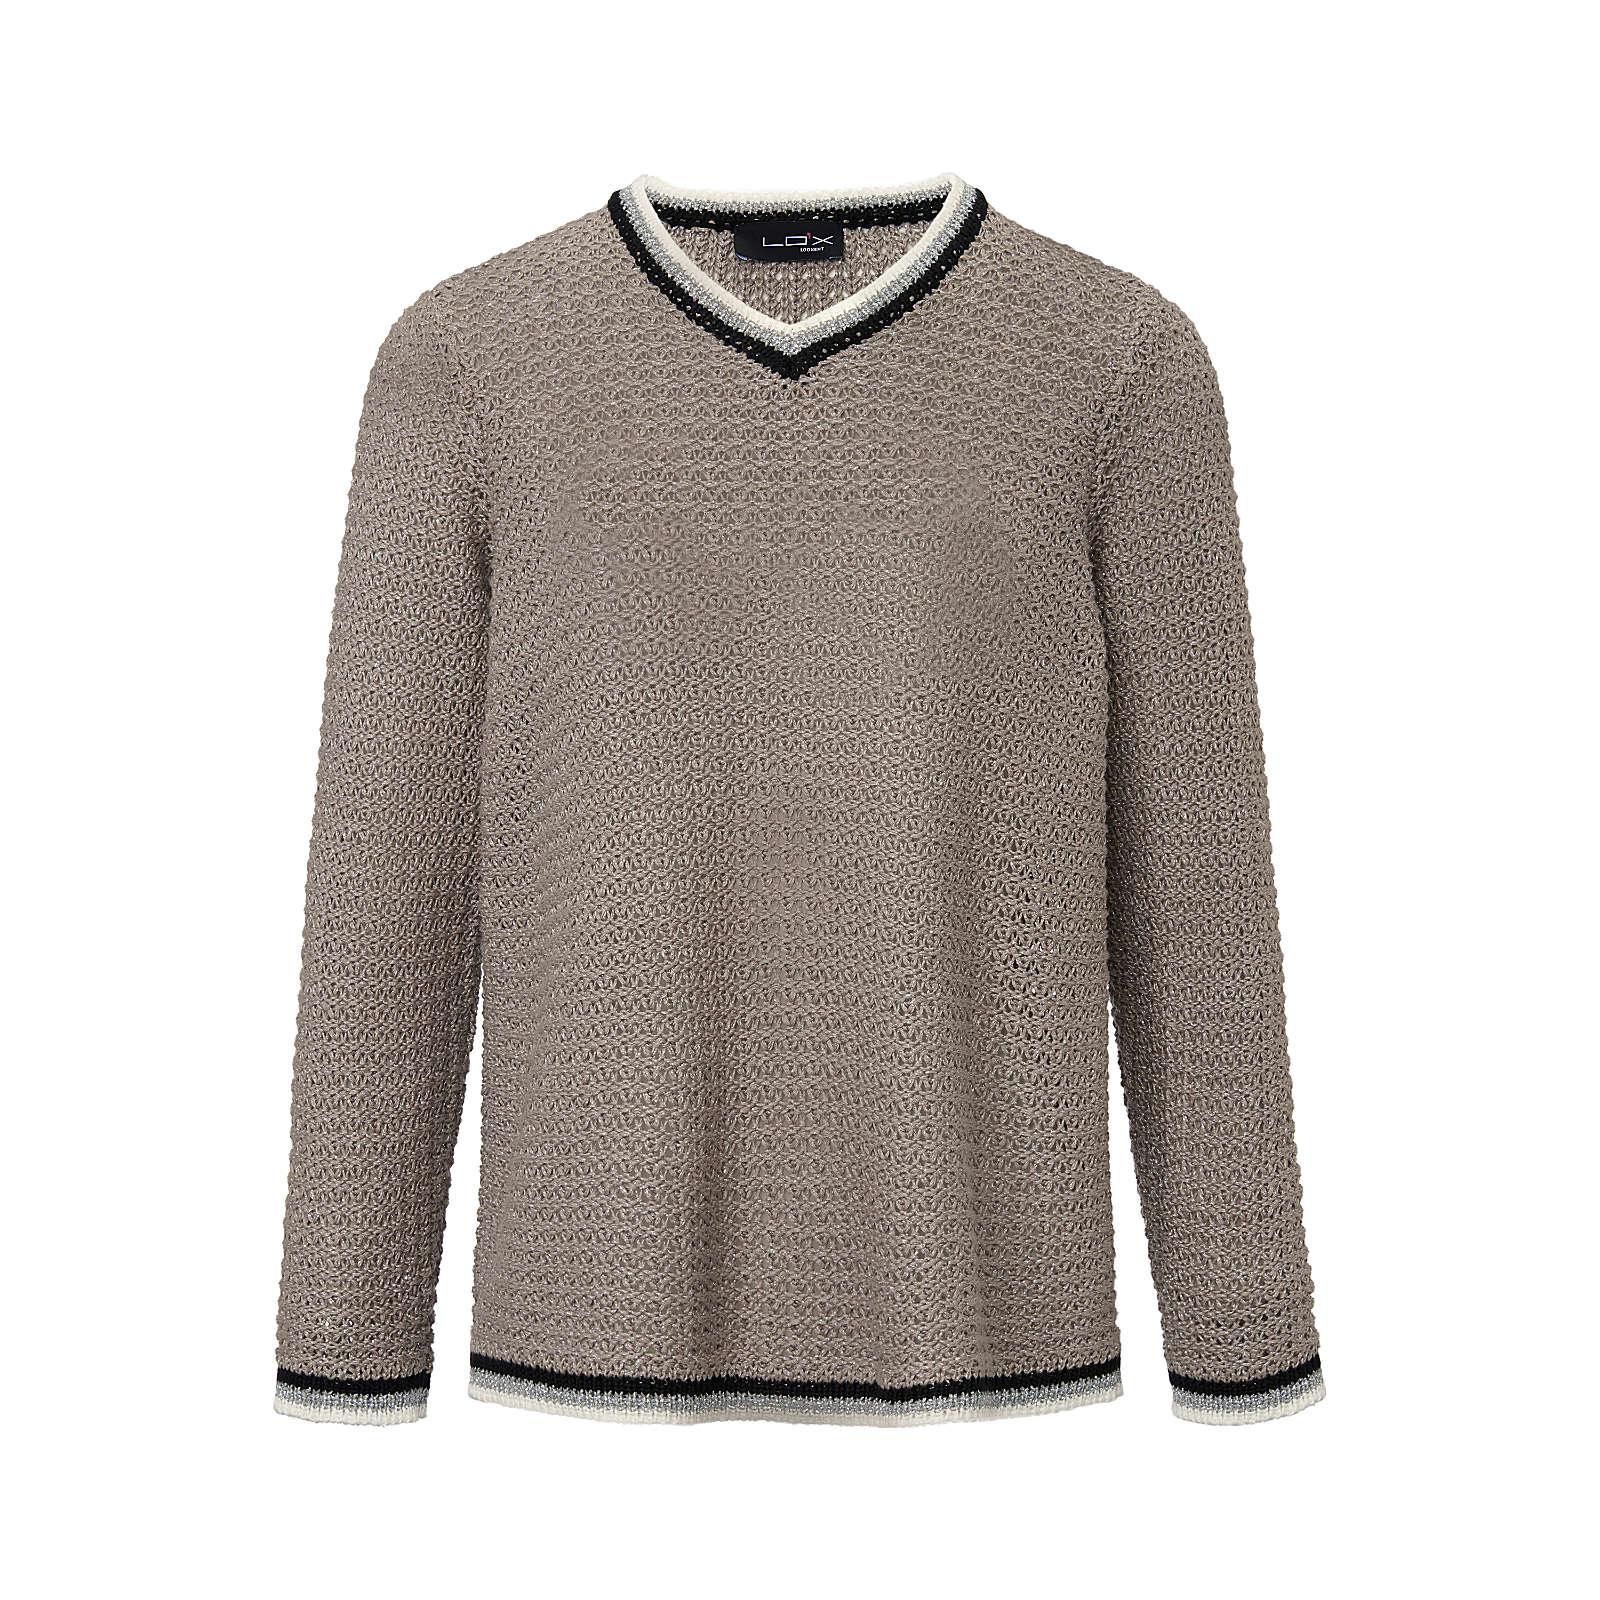 LOOXENT V-Pullover V-Pullover Pullover sand Damen Gr. 46